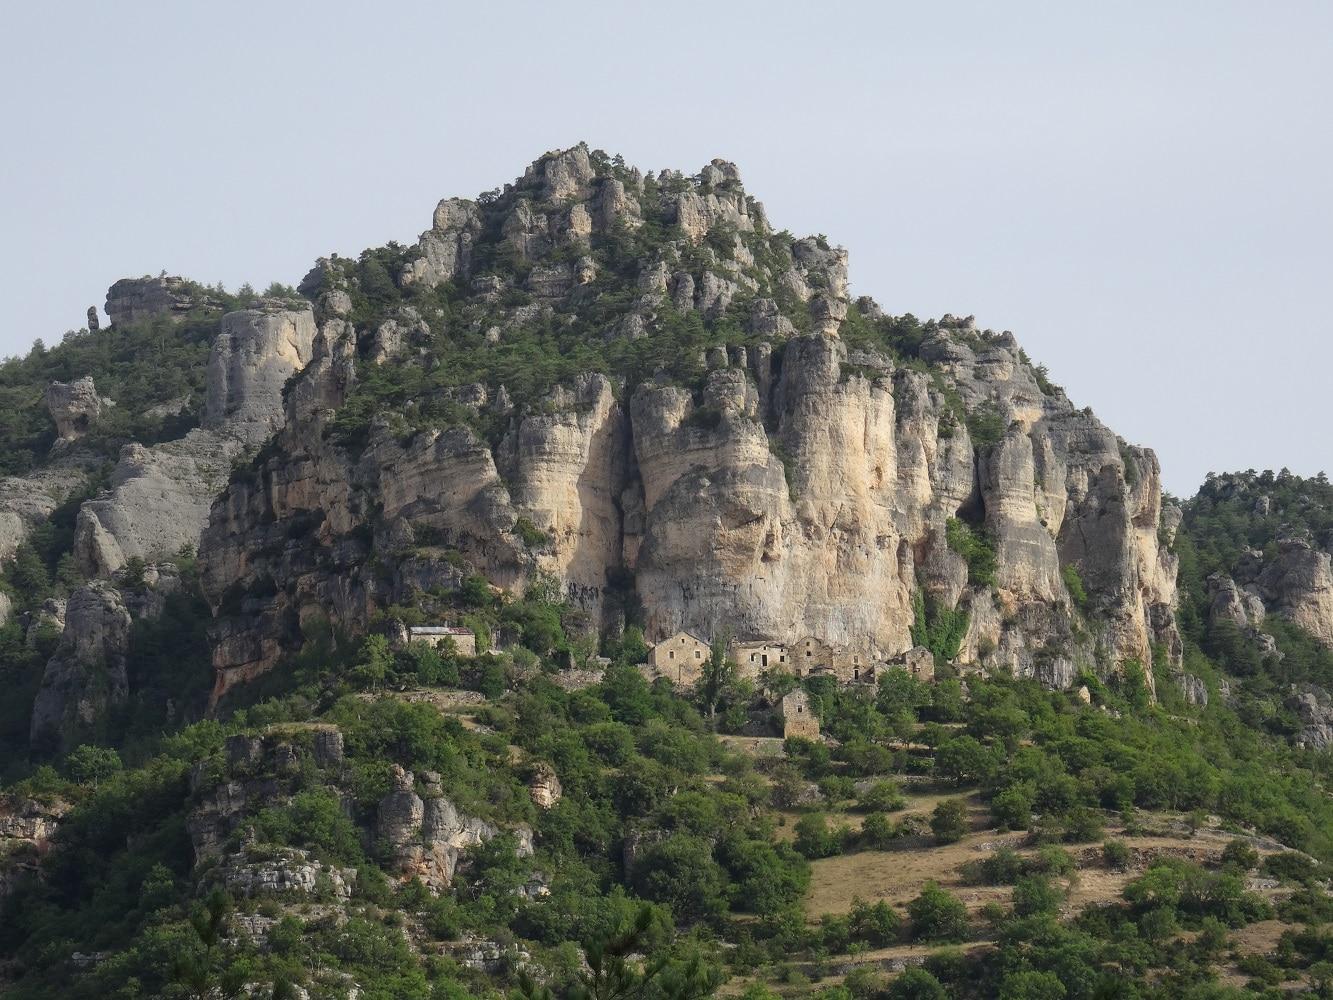 Gorges du Tarn, village troglotytique Les Eglazines